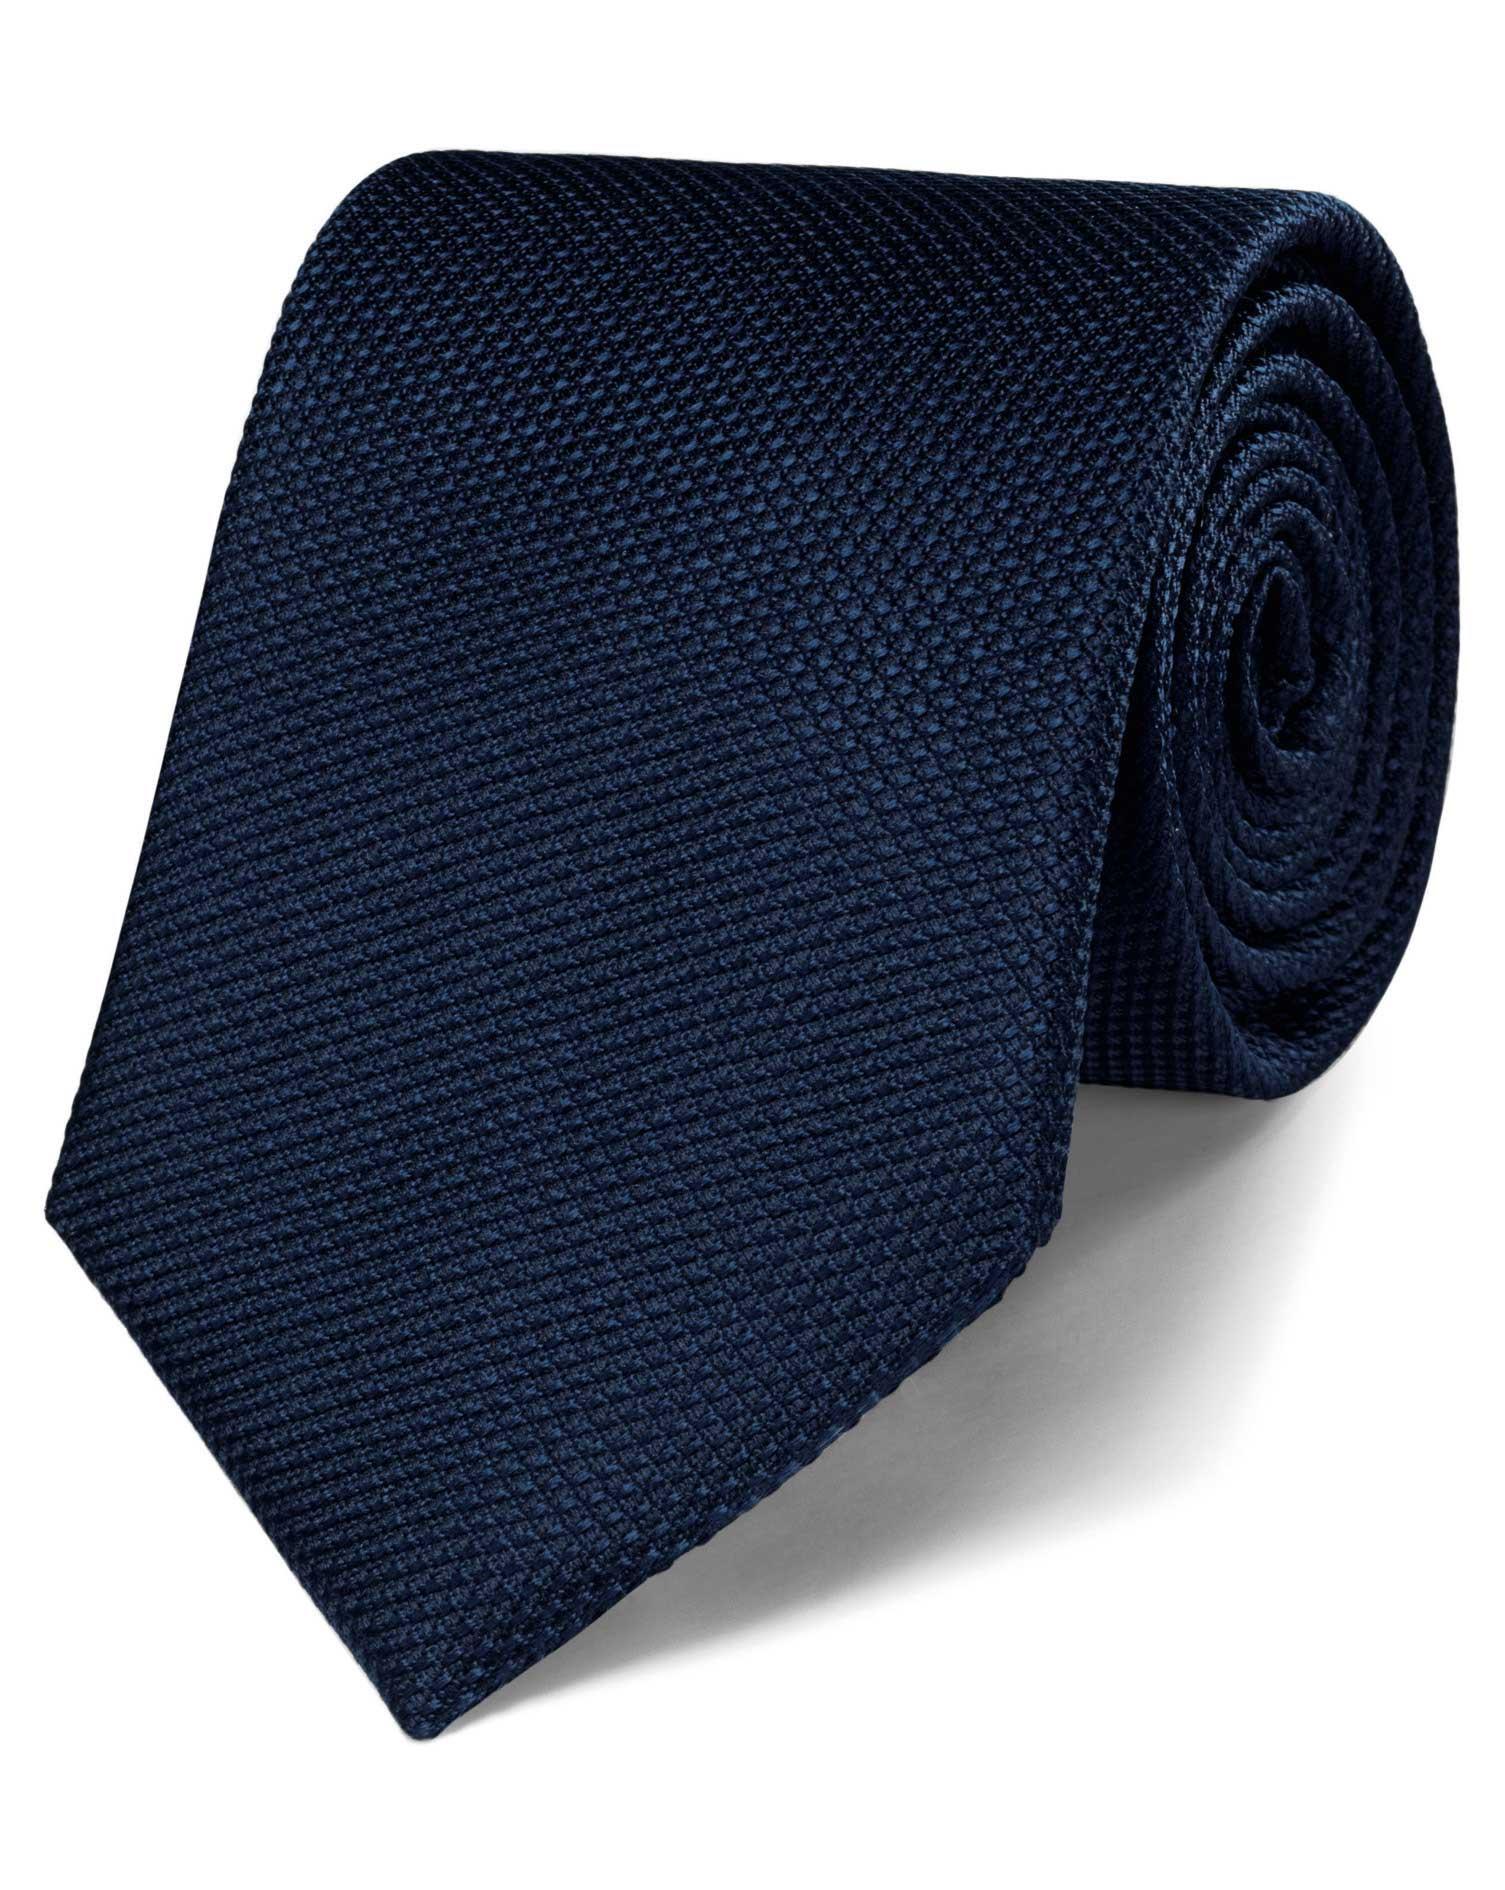 navy silk plain classic tie charles tyrwhitt